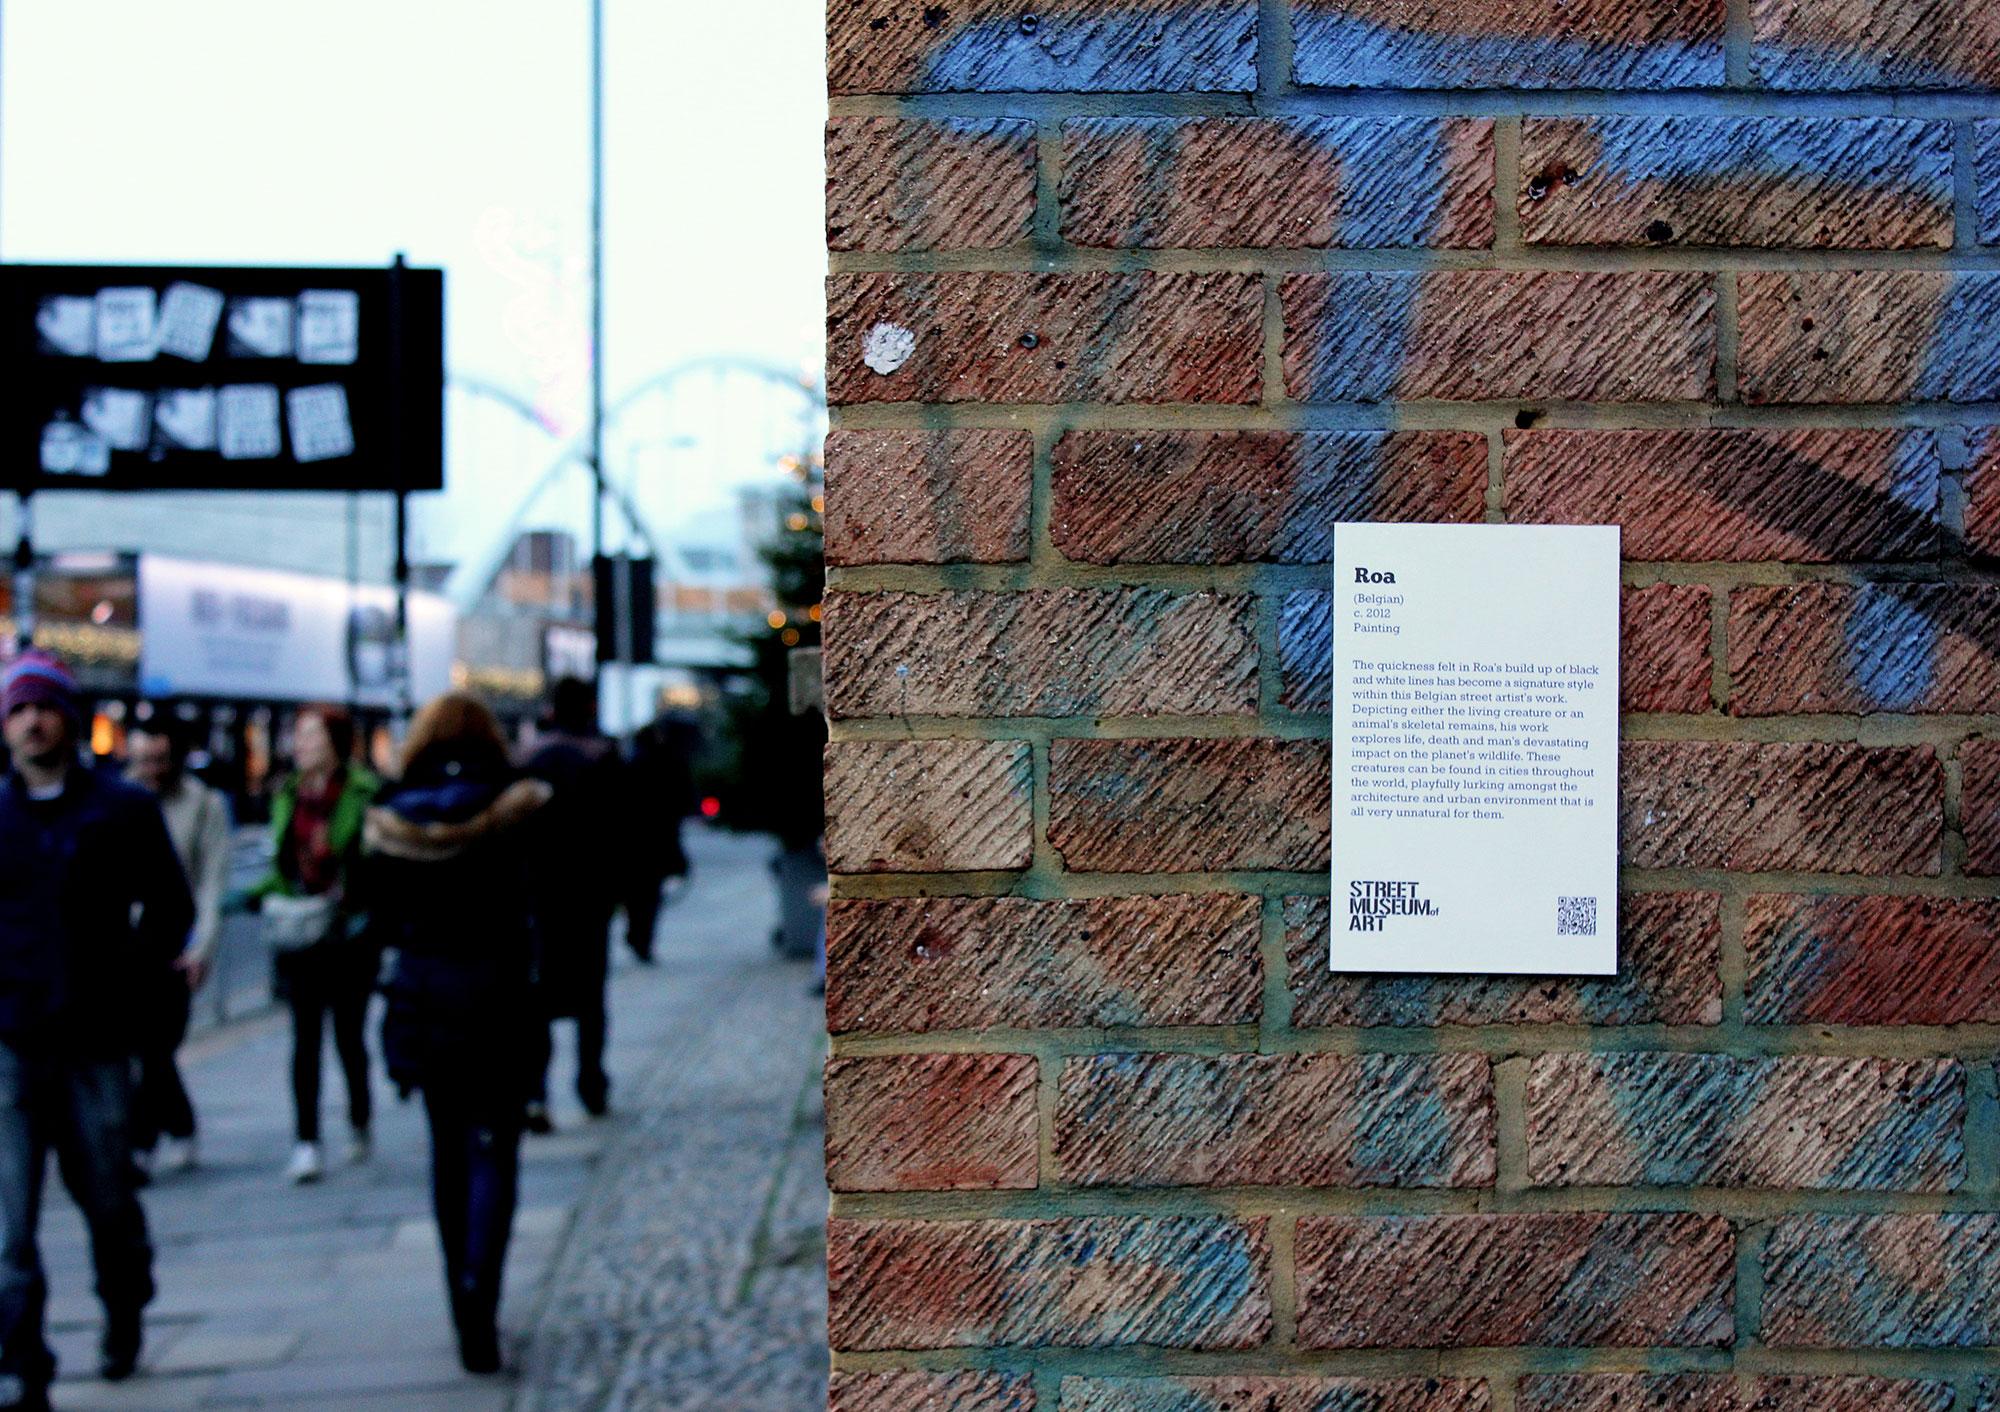 IMG_2203_Roa_London_2012-LABEL-WEB.jpg